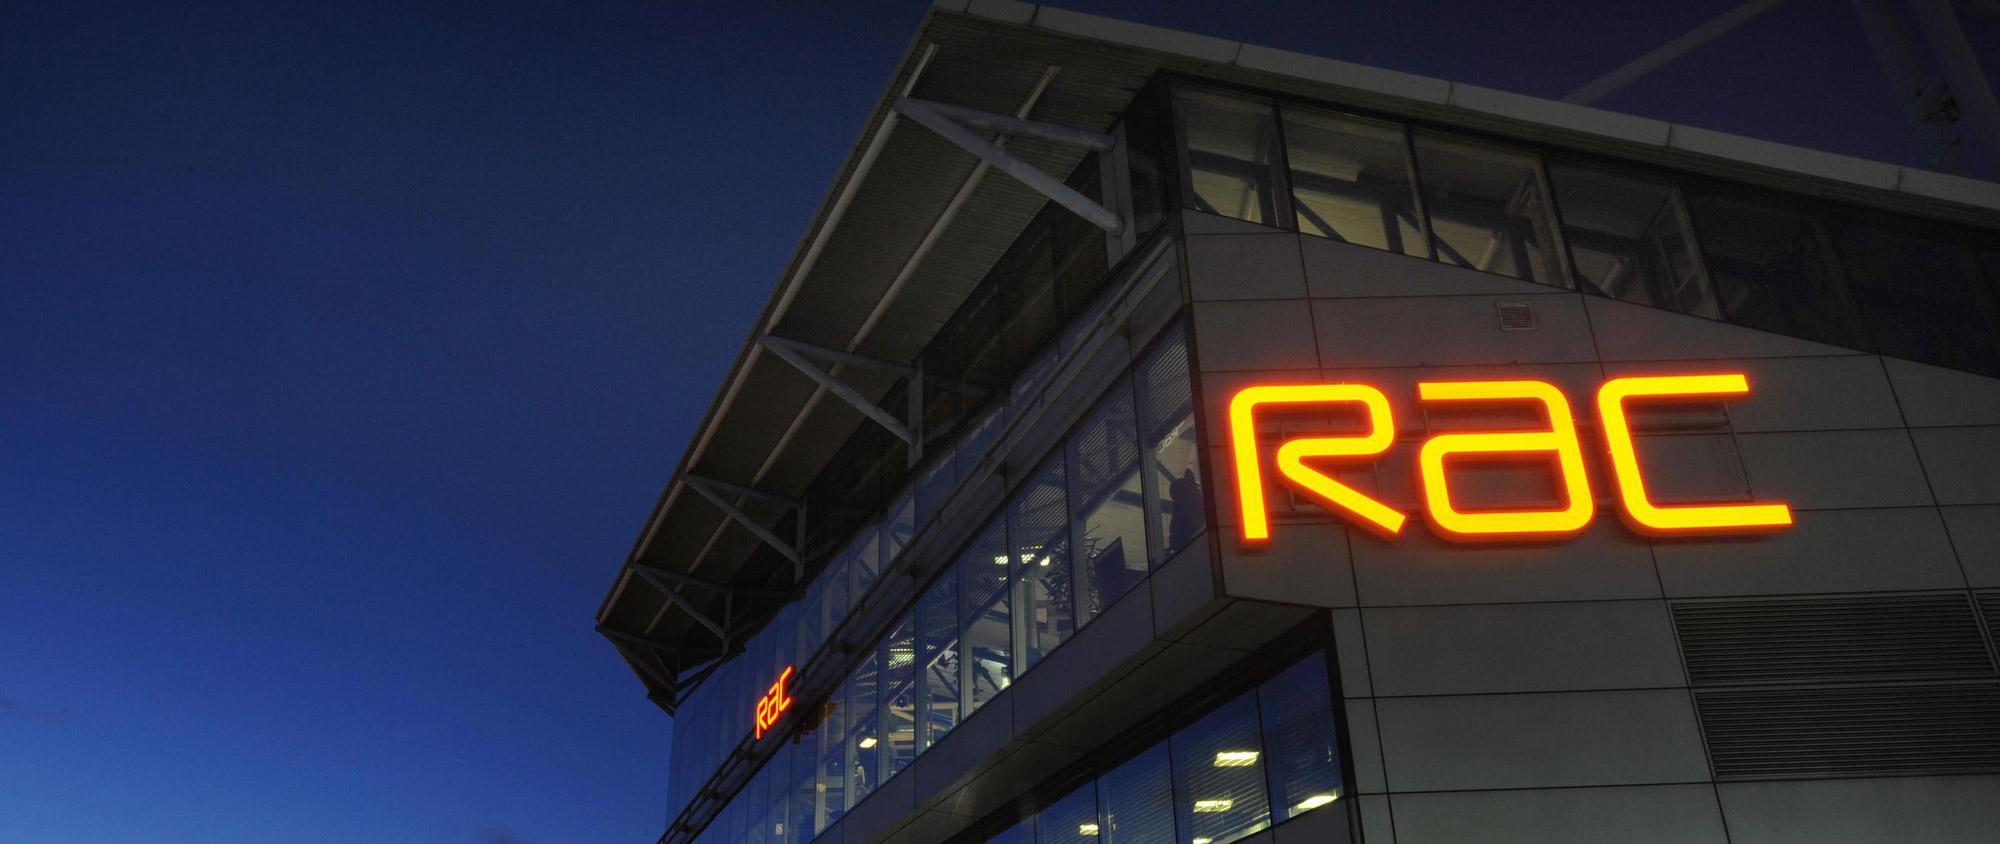 Rac Sign Image